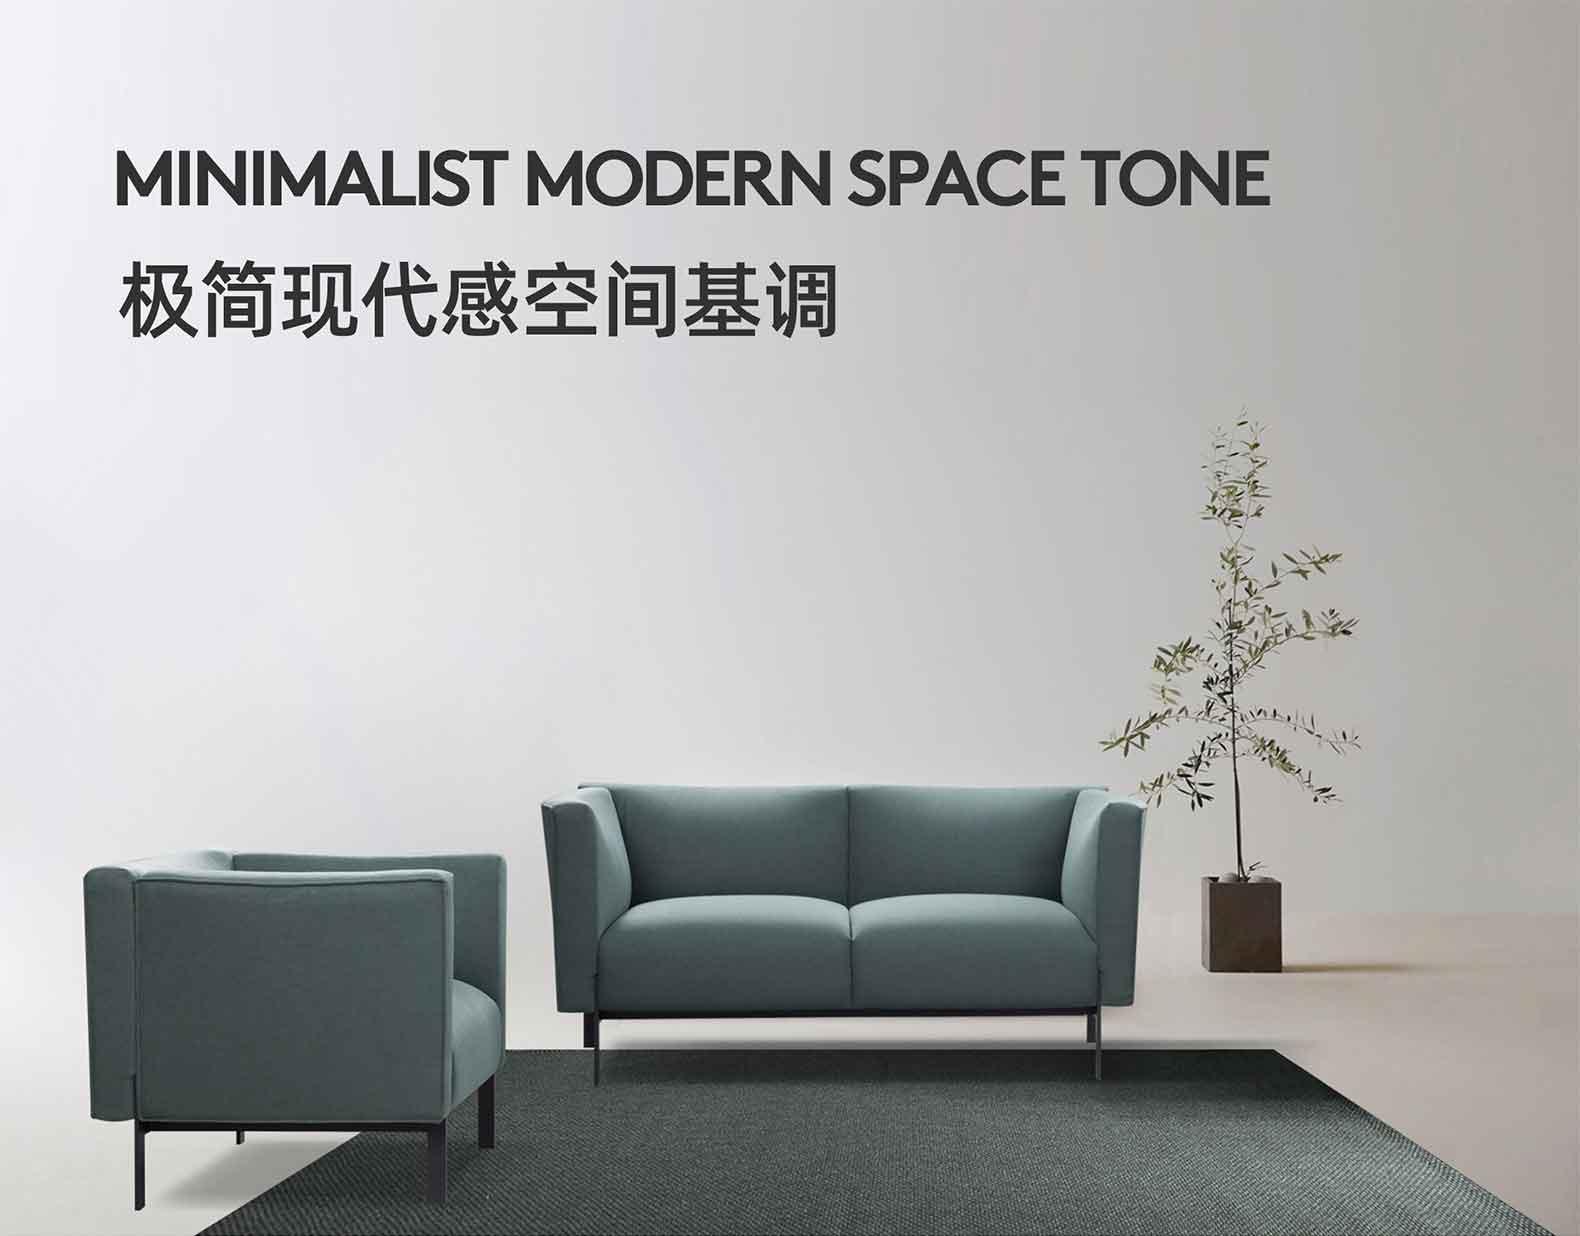 news-Multi-functional Lounge Sofa Series in Different Settings-GOJO-img